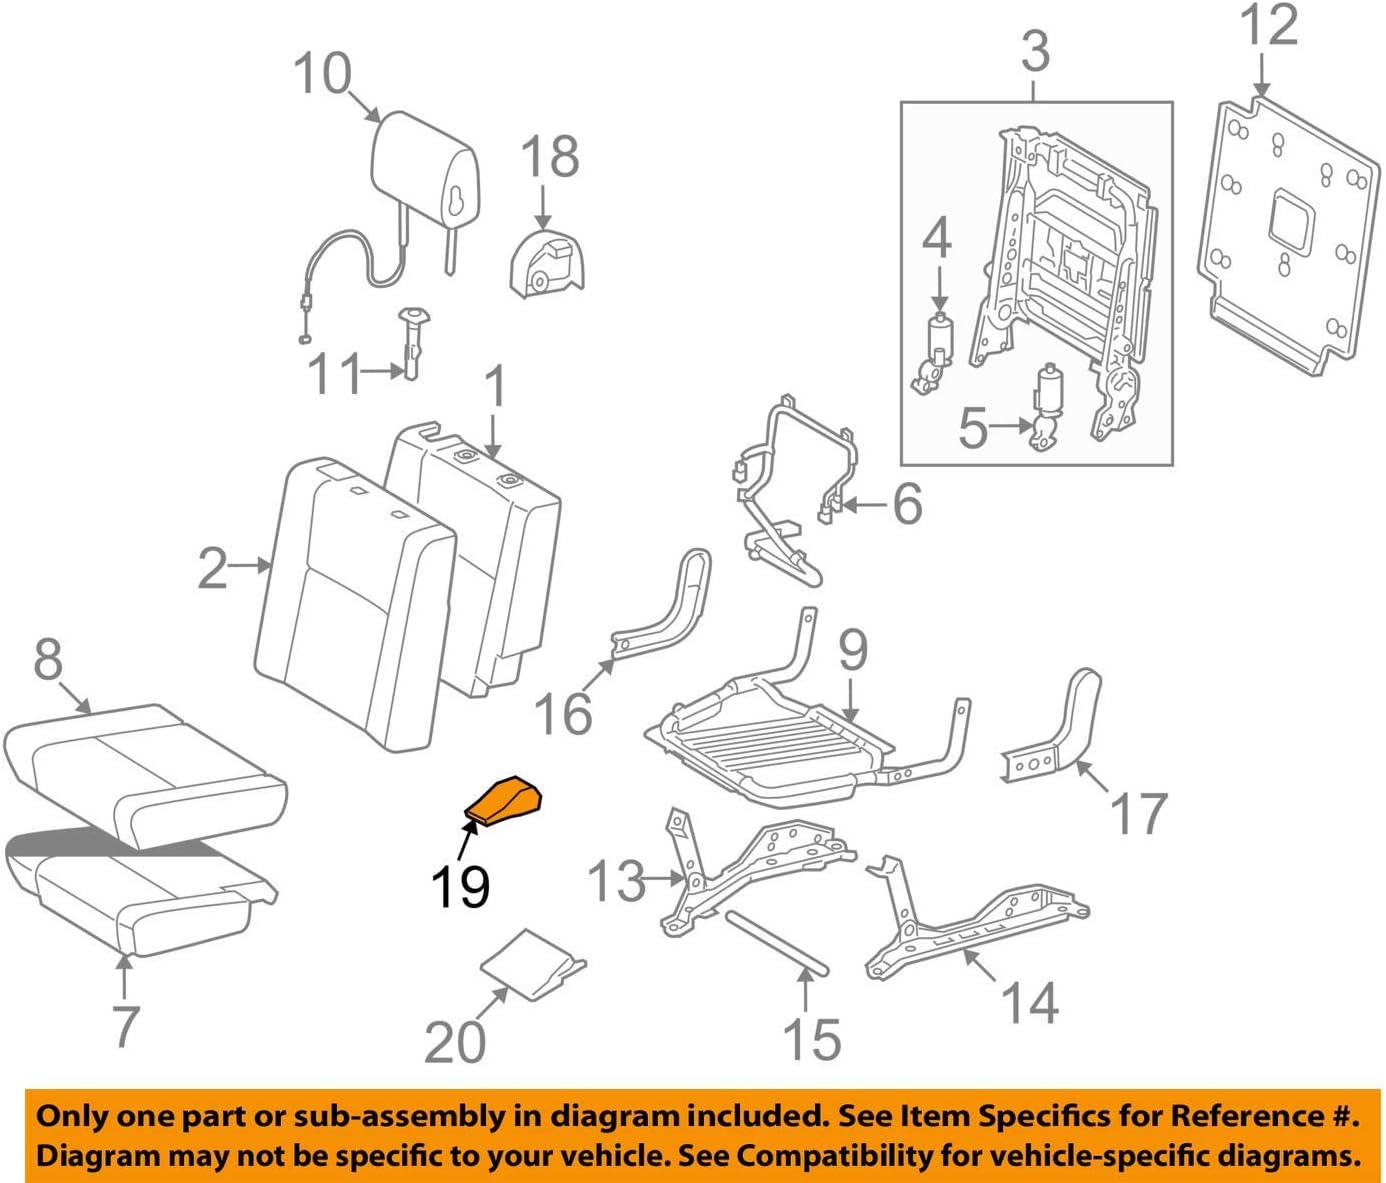 TOYOTA 72123-0C010-C0 Seat Bracket Cover 4 years Ranking TOP10 warranty Track